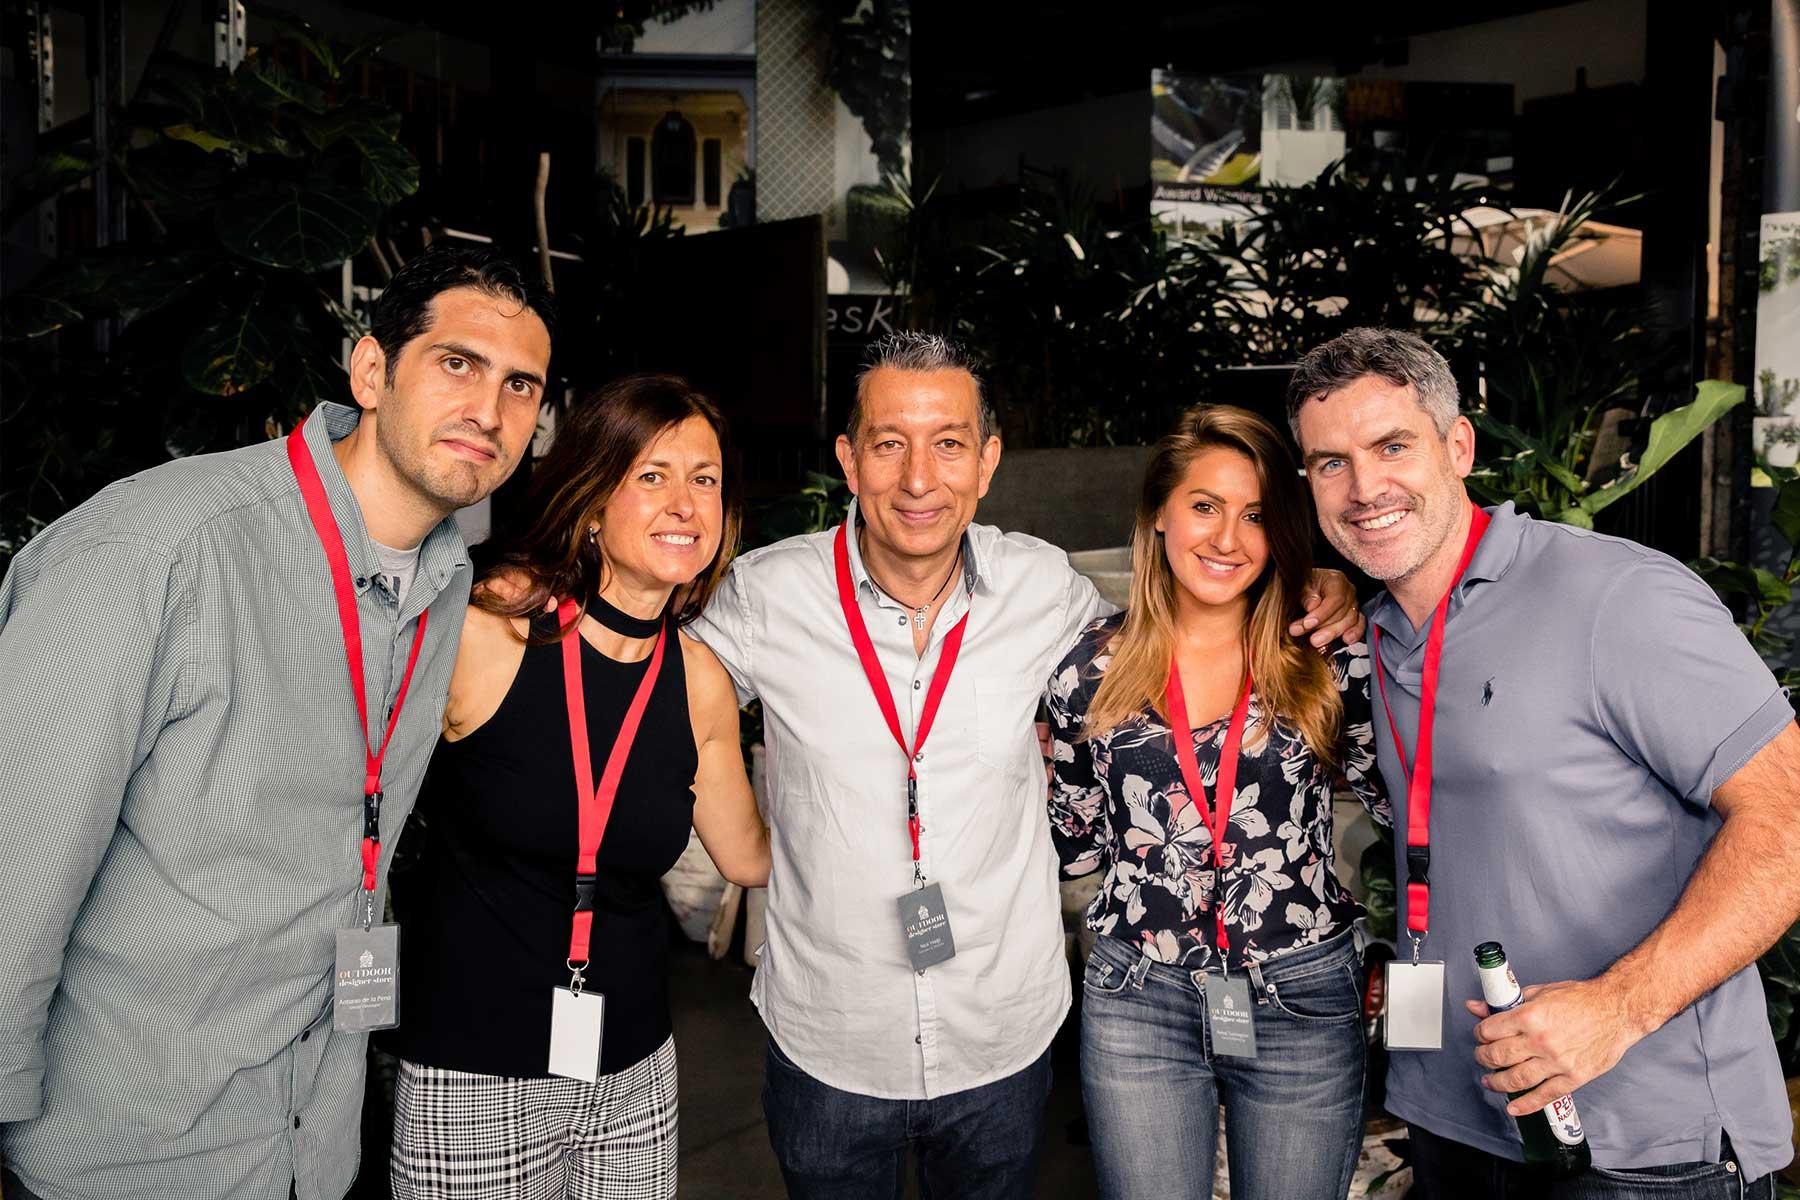 Antonio de la Peña , Alexandra Hadji, Nick Hadji, Anna Turkington, and Richard Bailey from ODS